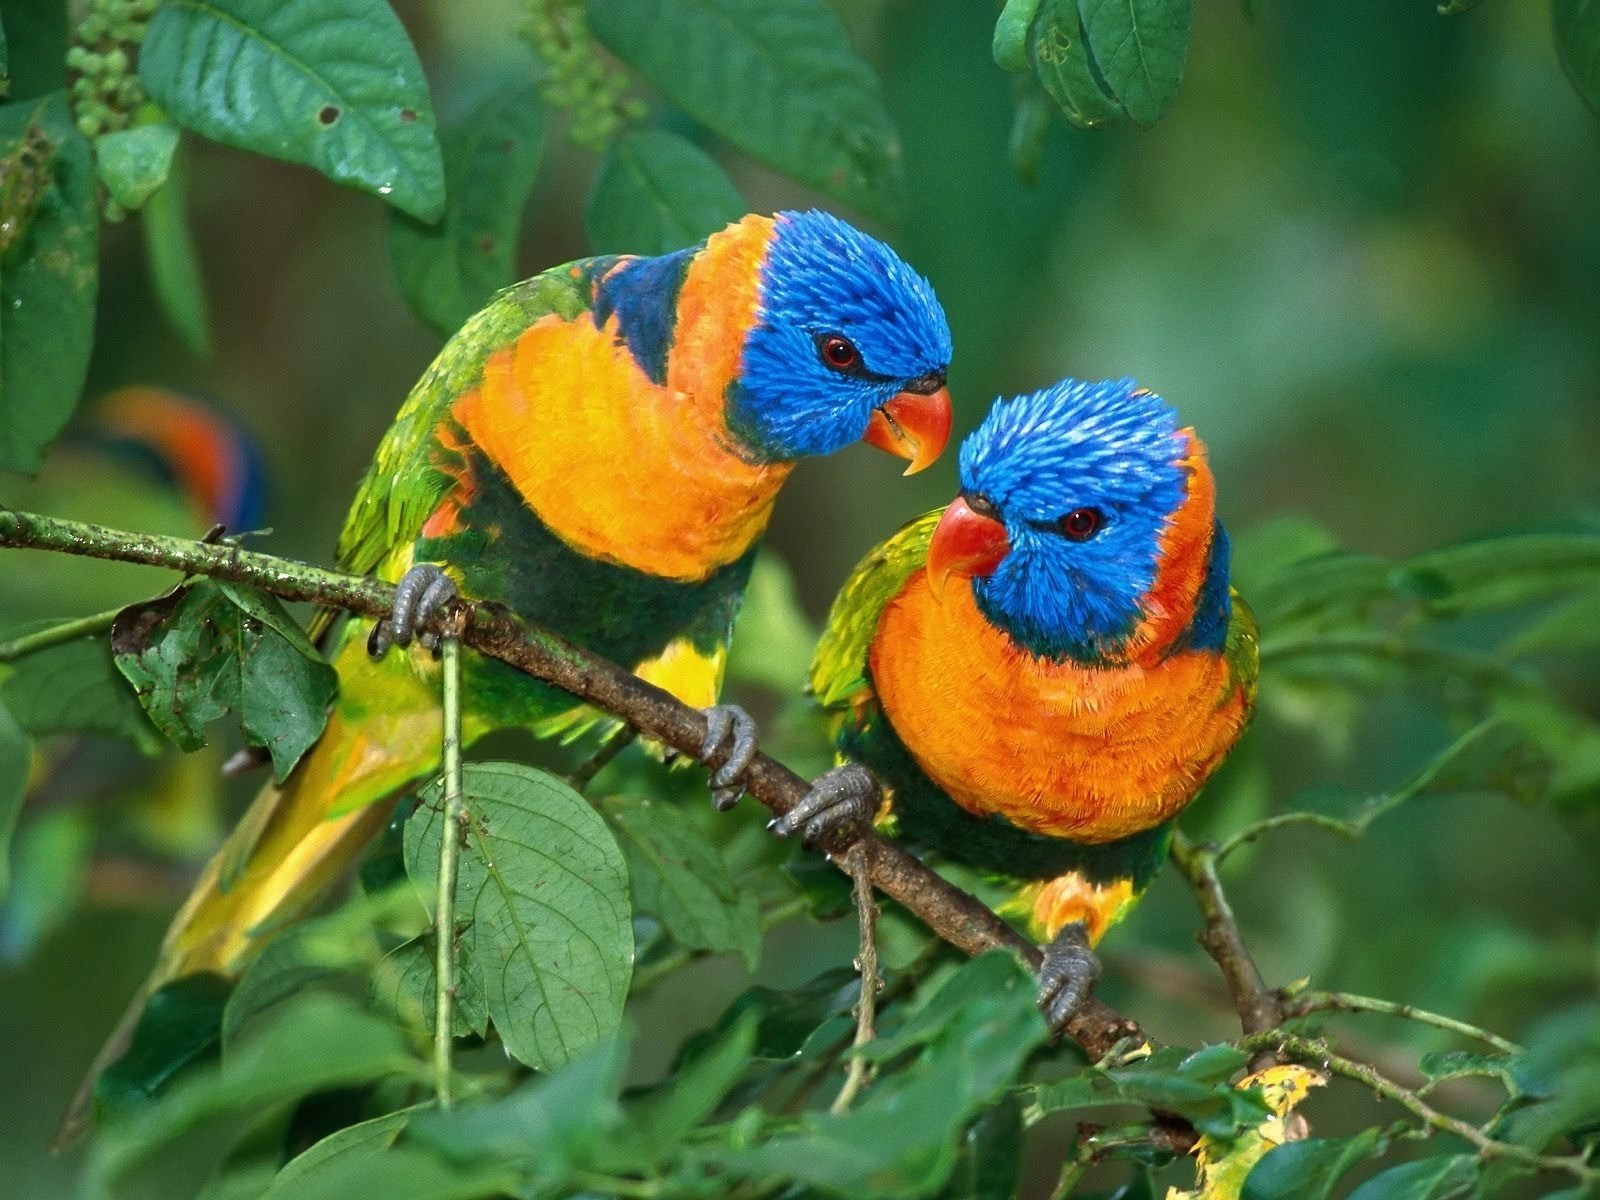 Two Cute Baby Birds Wallpaper